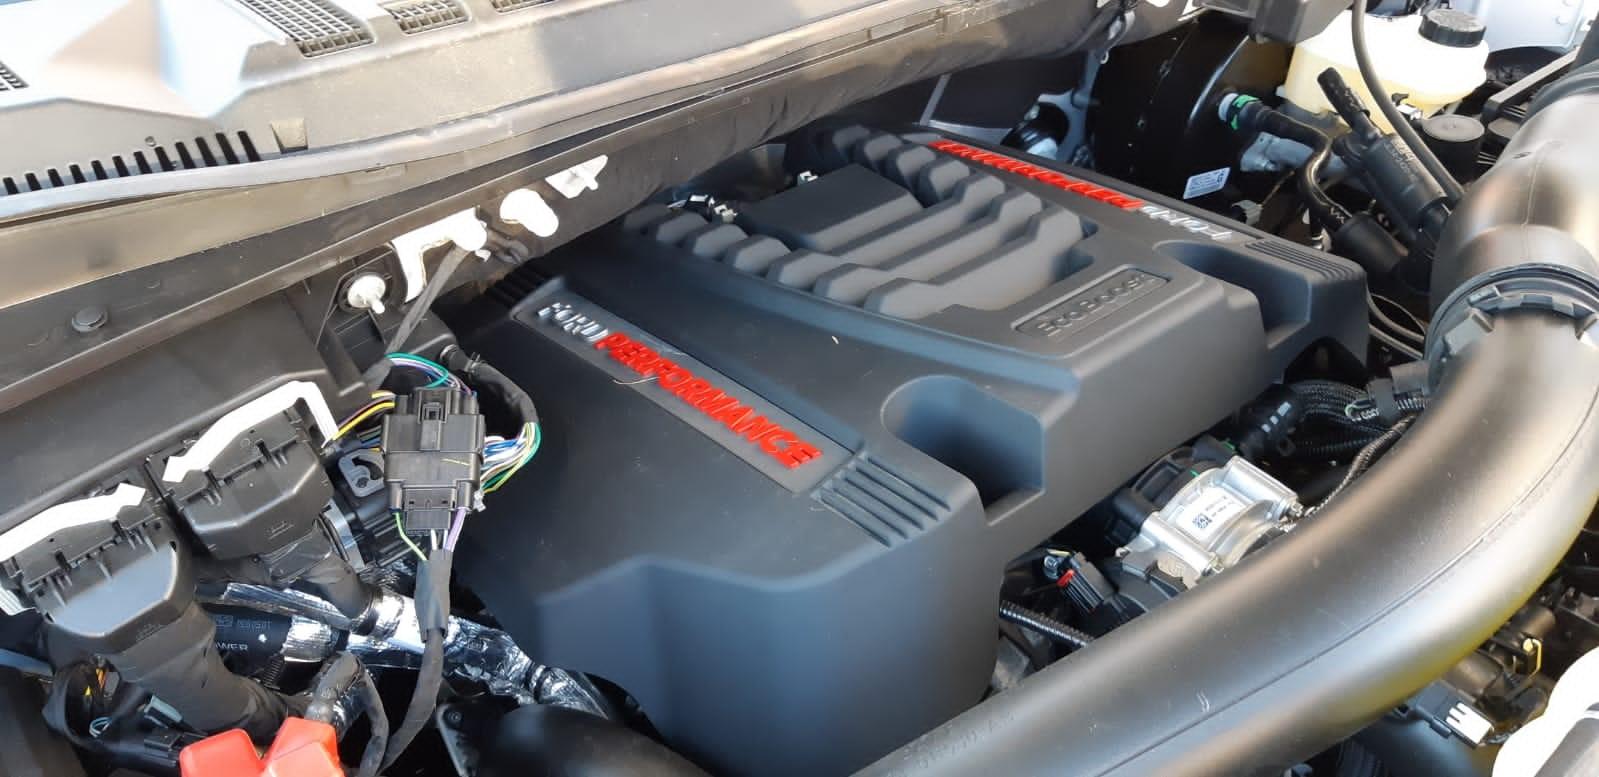 FORD F150 Raptor v6 3.5l ecoboost bva 10 450hp